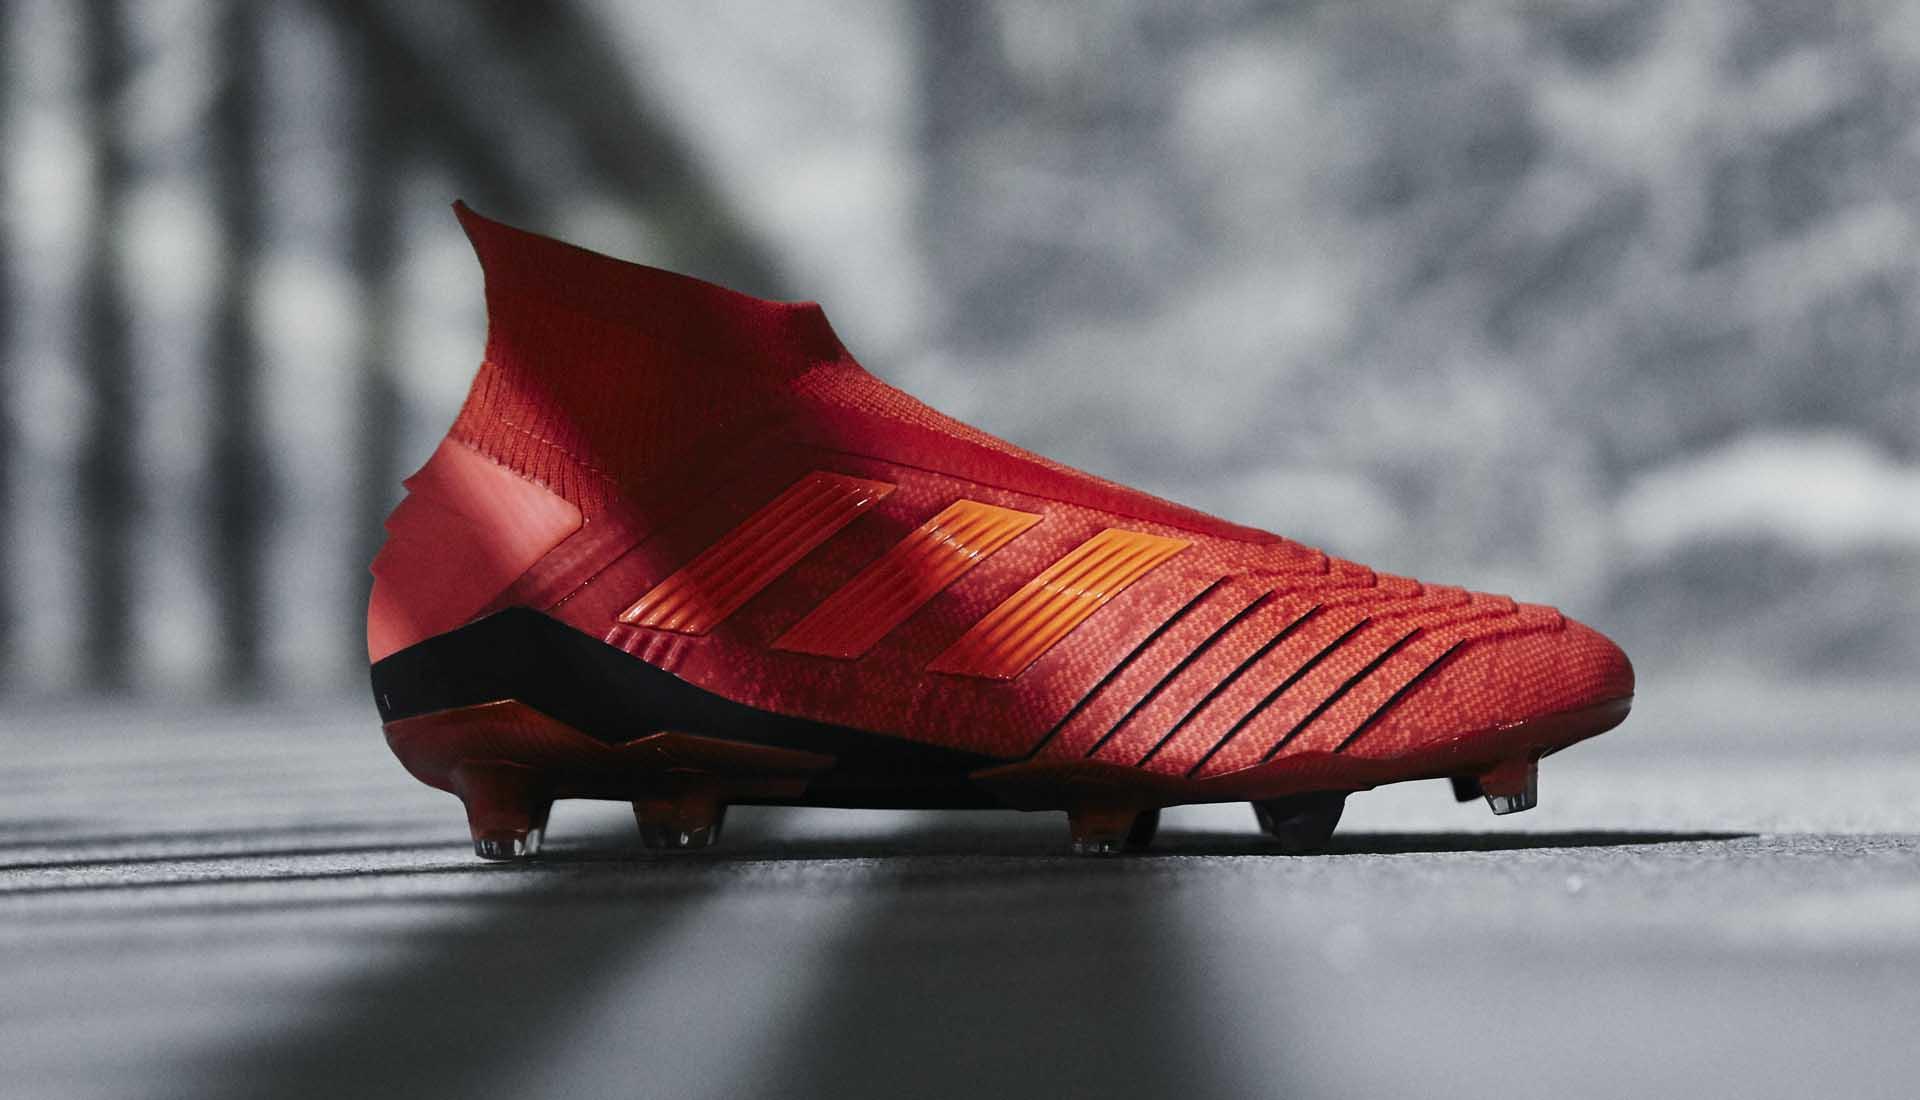 4-adidas-predator-18-initiator-min.jpg